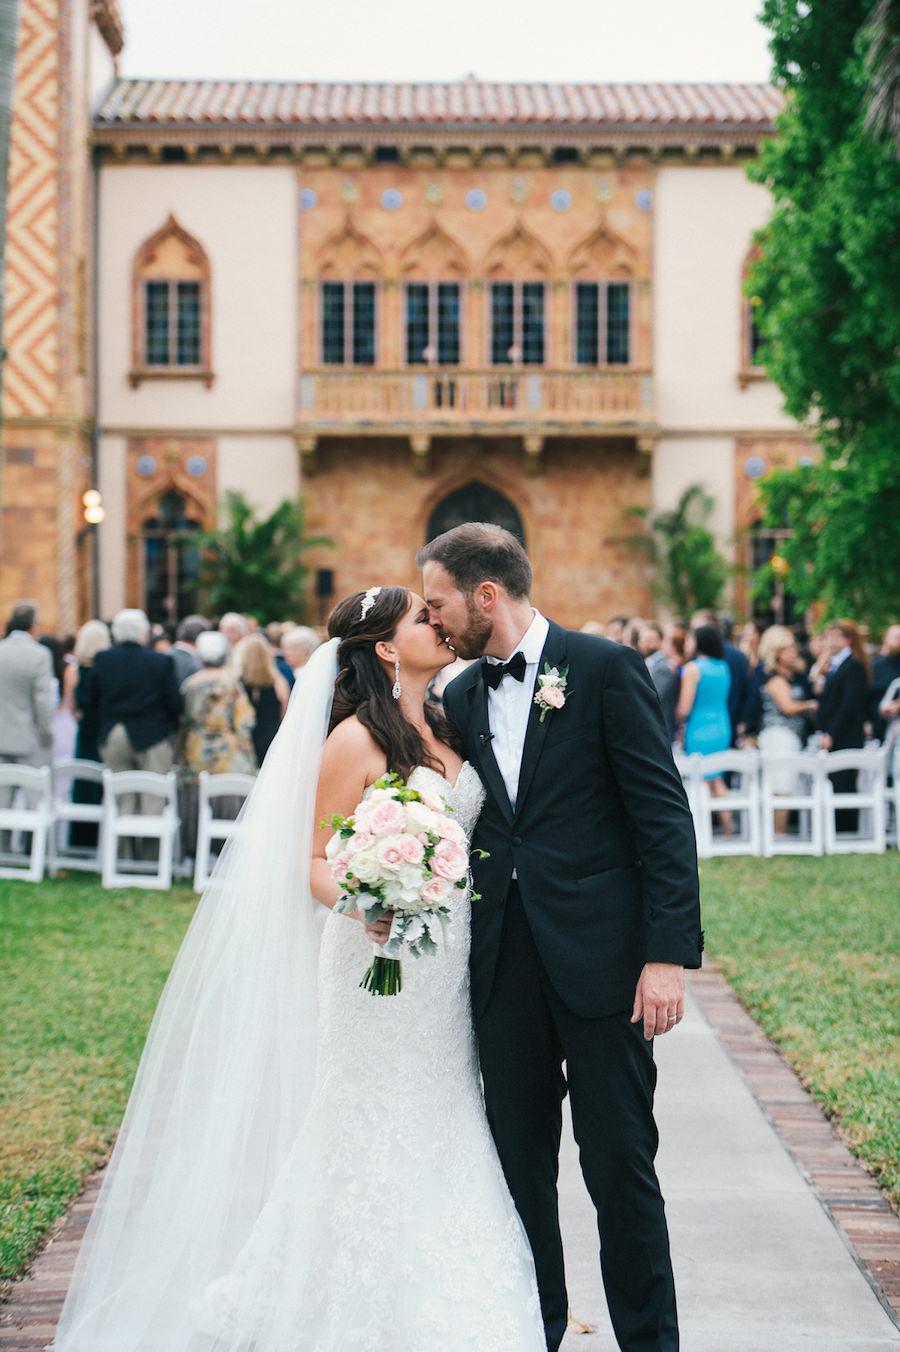 Bride and Groom Walking Down The Aisle | Outdoor Sarasota Ceremony Wedding Venue Ca D'Zan Ringling Mansion | Sarasota Wedding Planner NK Productions